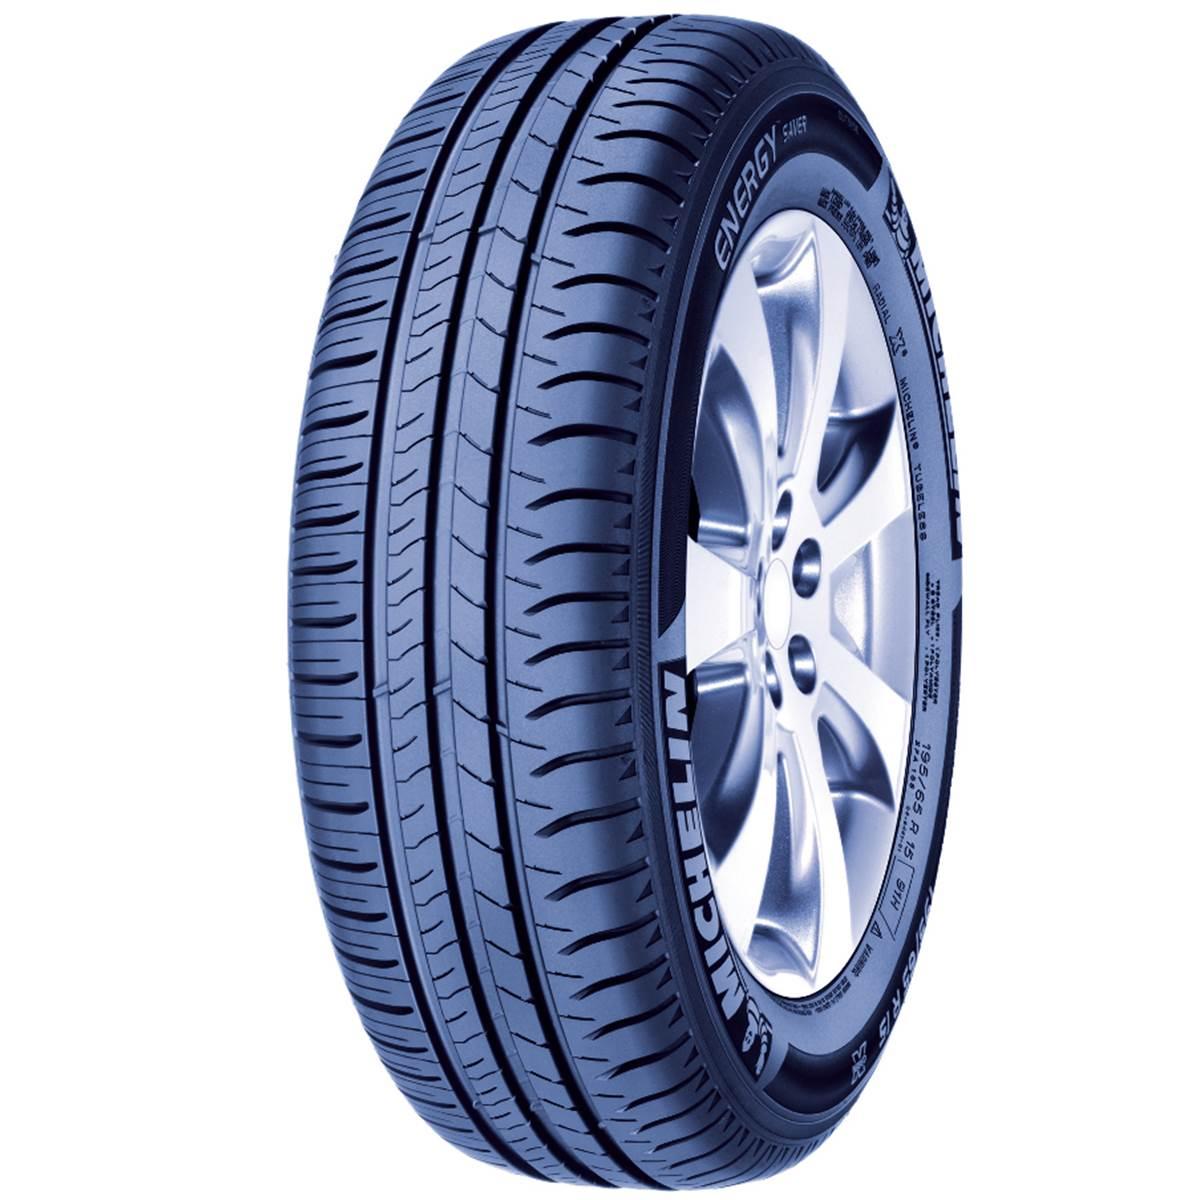 Pneu Michelin 185/60R15 84T Energy Saver